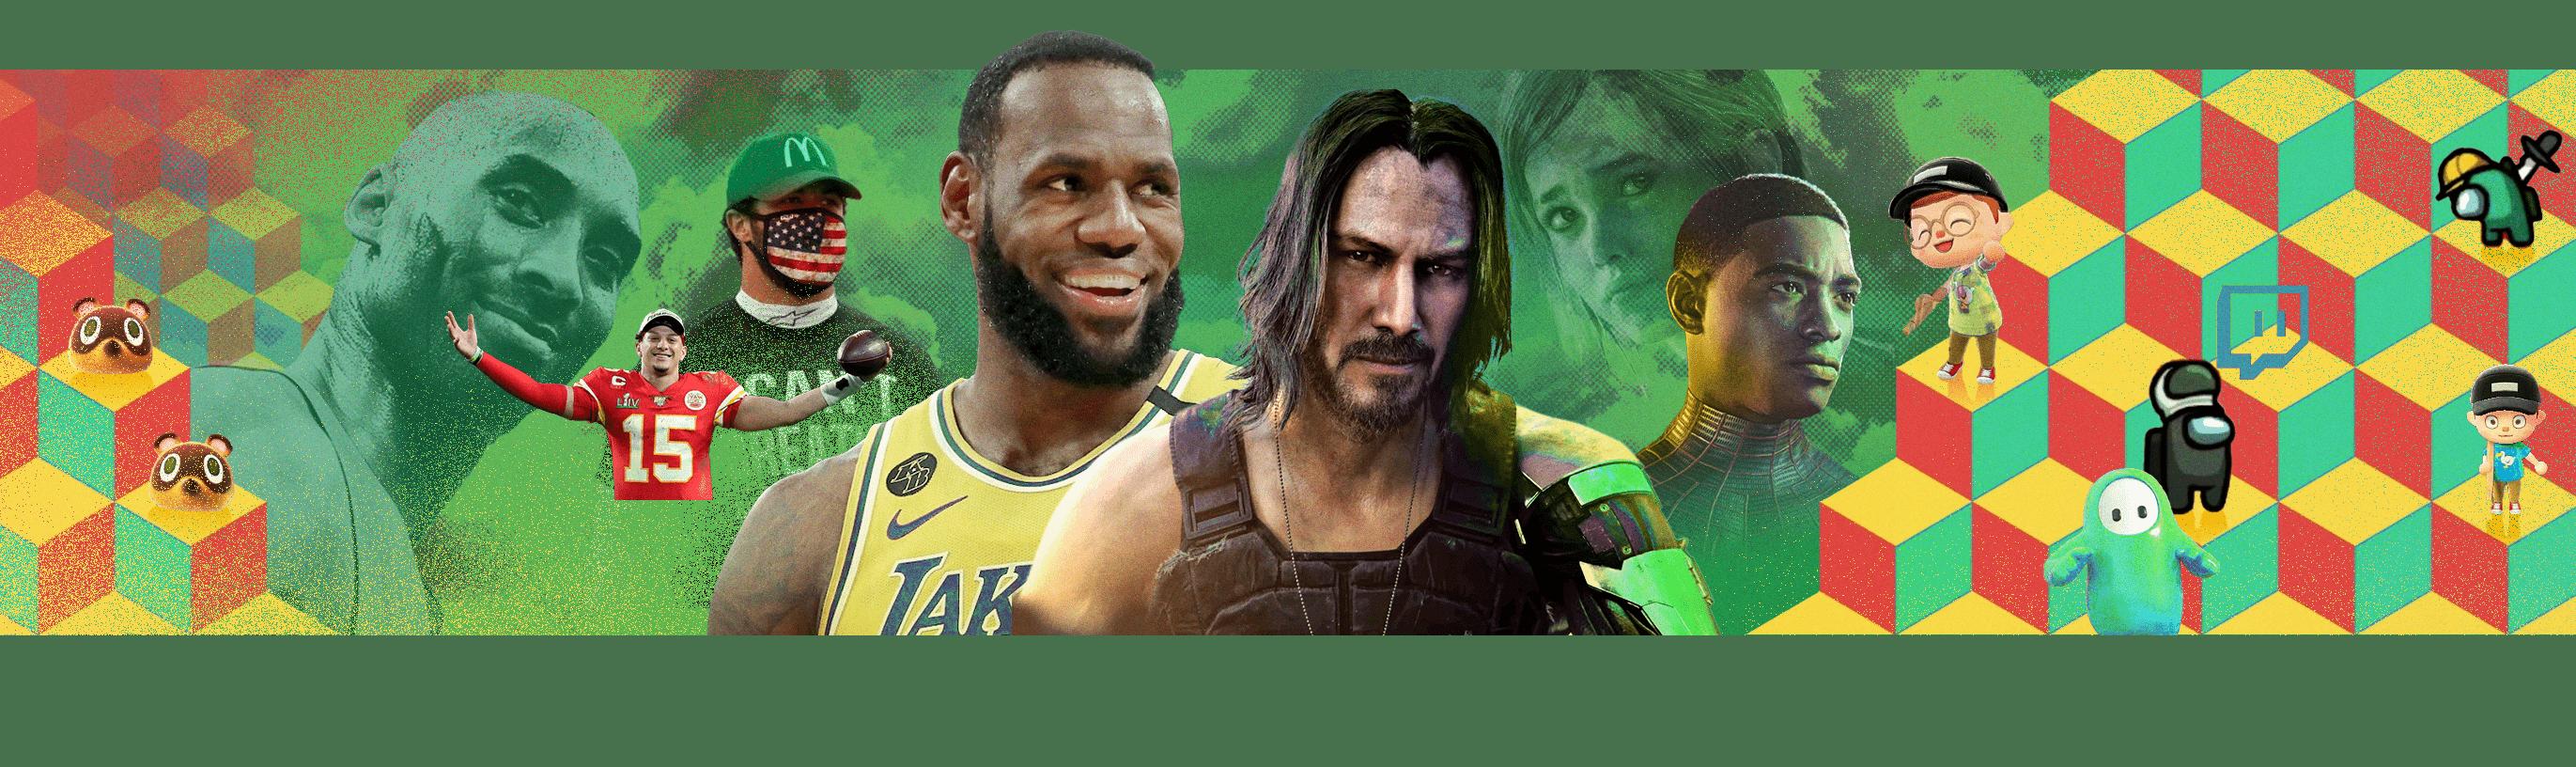 Sports / Gaming